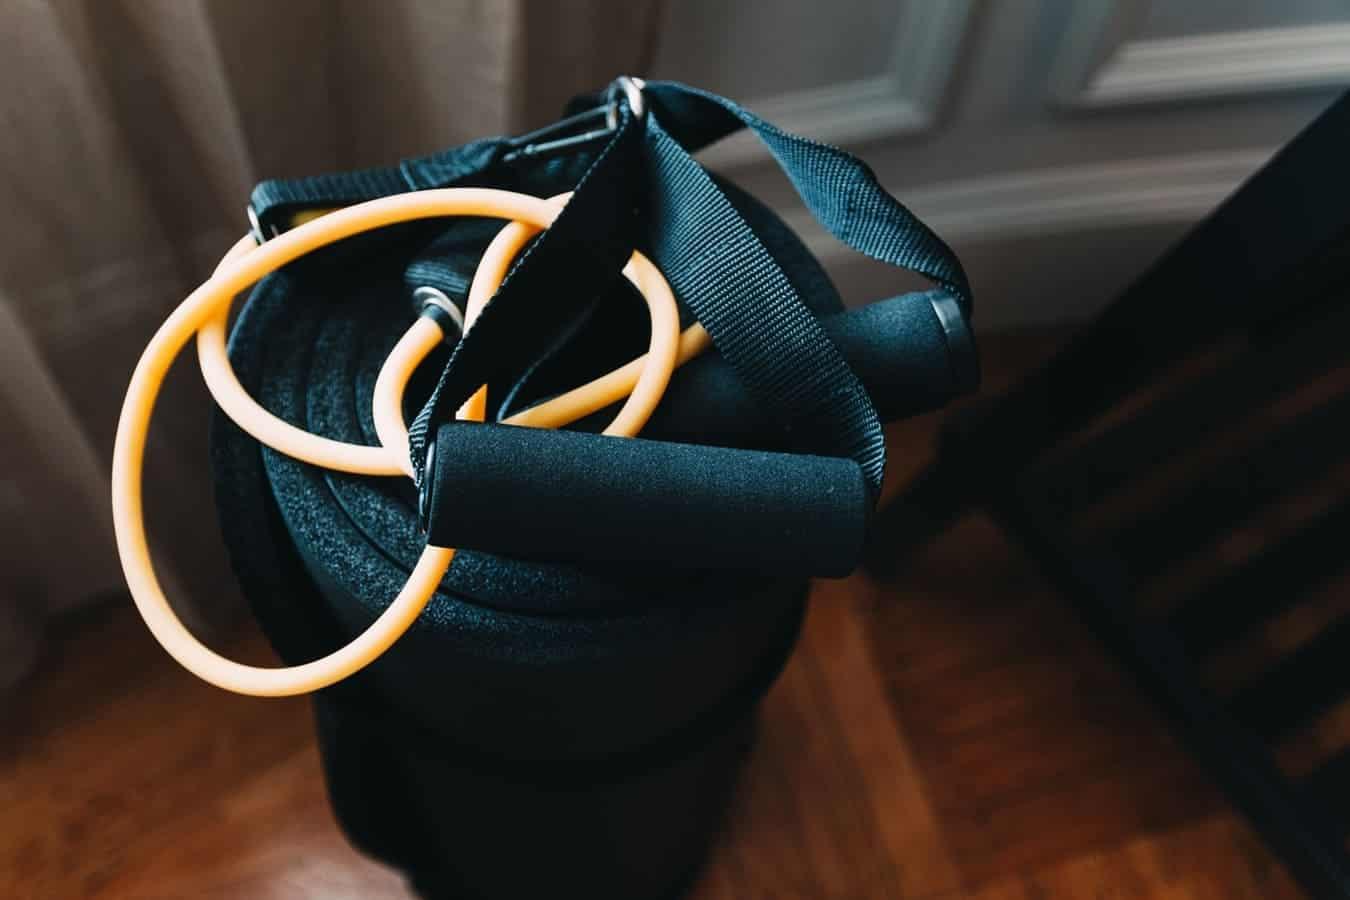 Resistance Bands On Top Of Bag